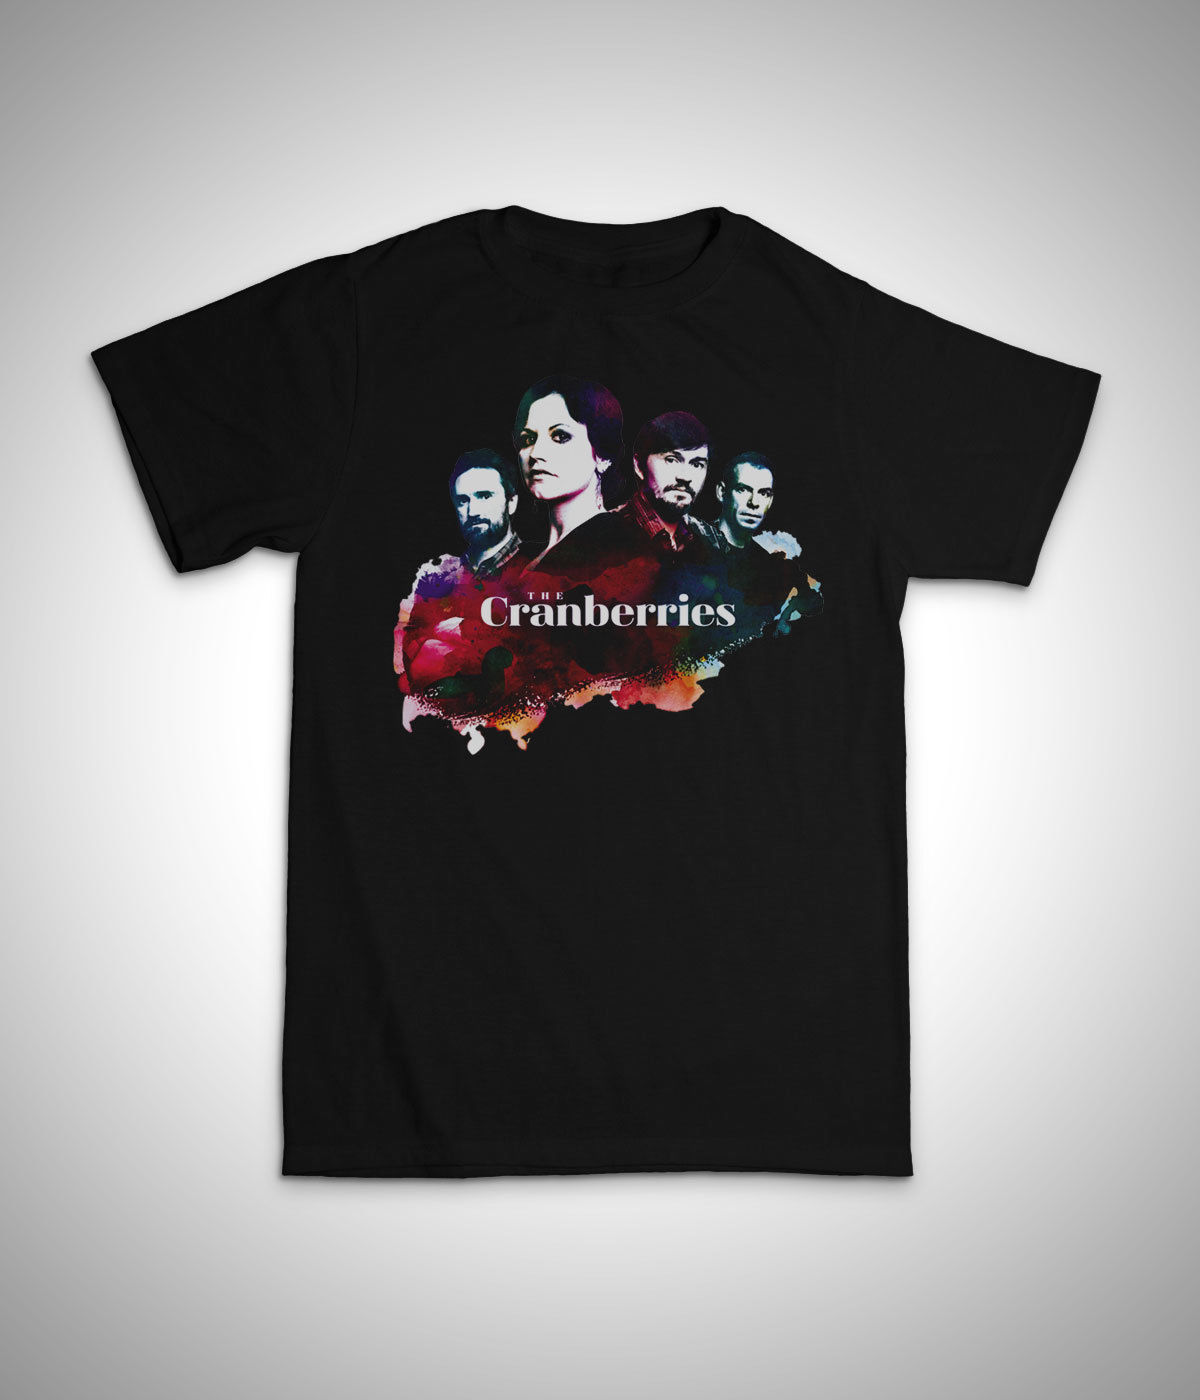 Lingonberry rozen t-shirt unisex Dolores O'Riordan vrouwen Man cadeau zwart 2018 nieuw merk